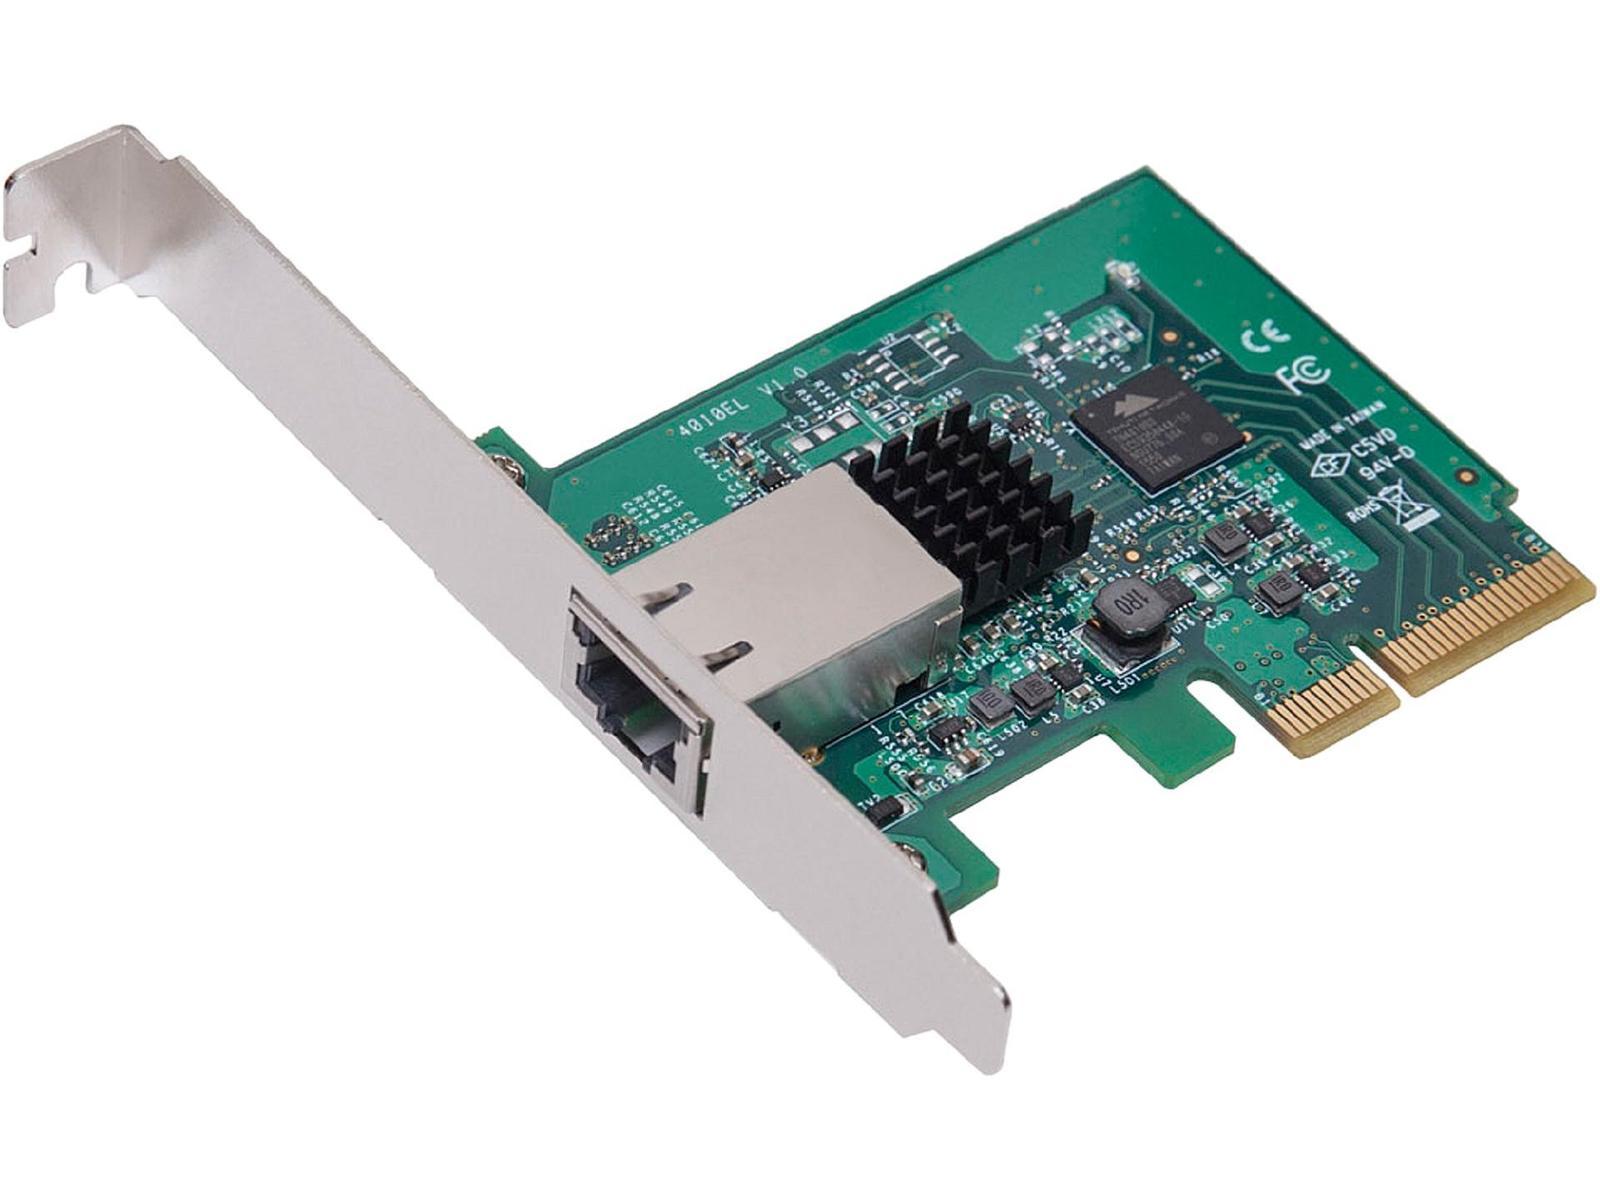 Syba SY-PEX24056 PCIe x4 10 Gbit/s Network Adapter